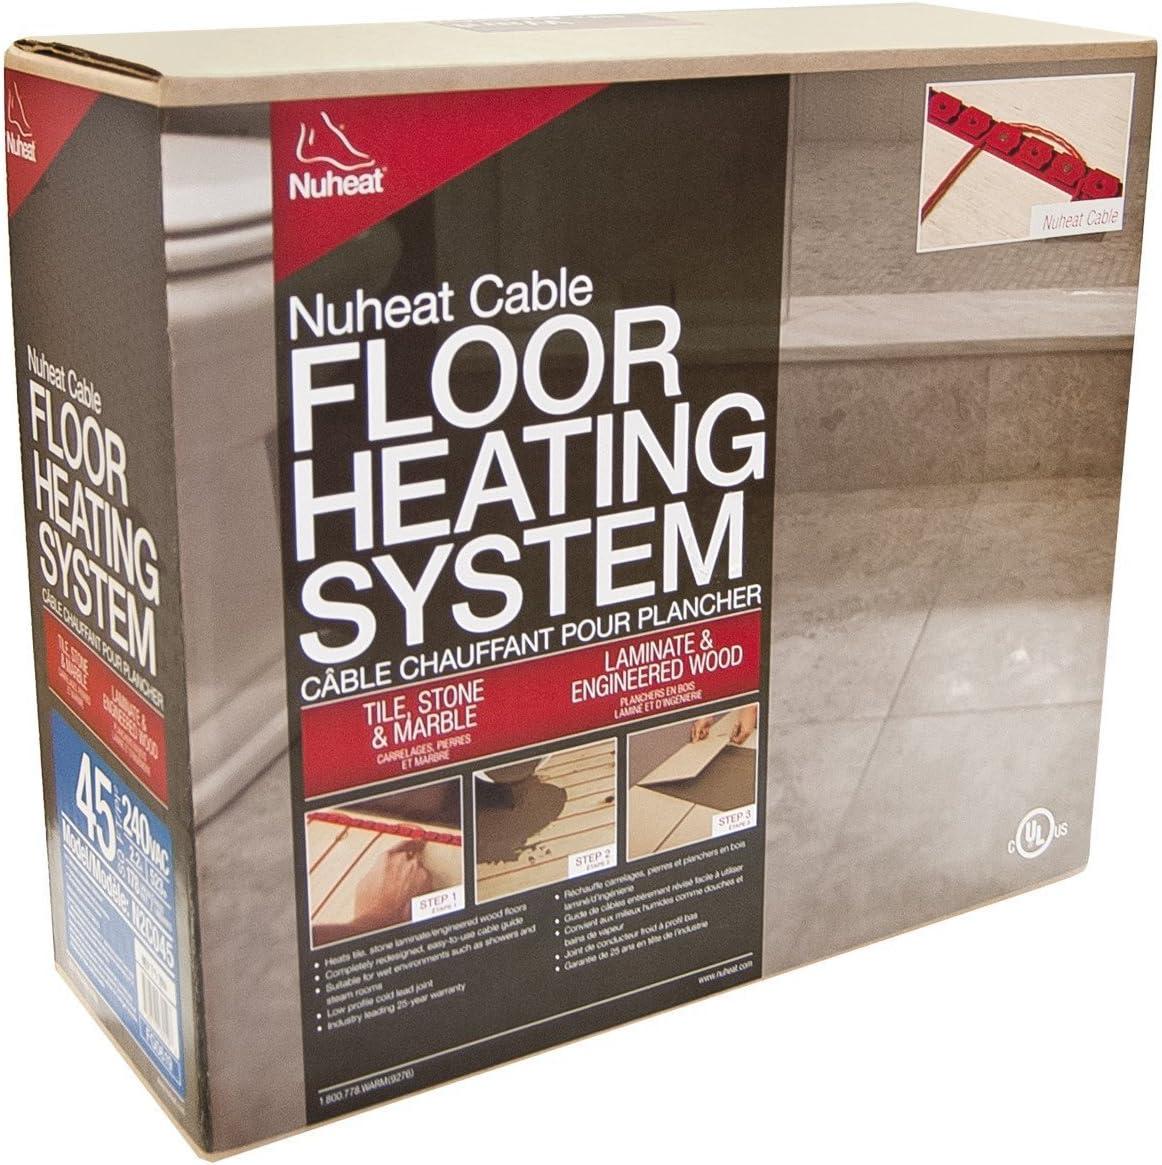 Nuheat Electric Floor Heat Cable Warming Floors 120V / 240V All Sizes/Models (N1C030 120V 30 SqFt Heat Cable)